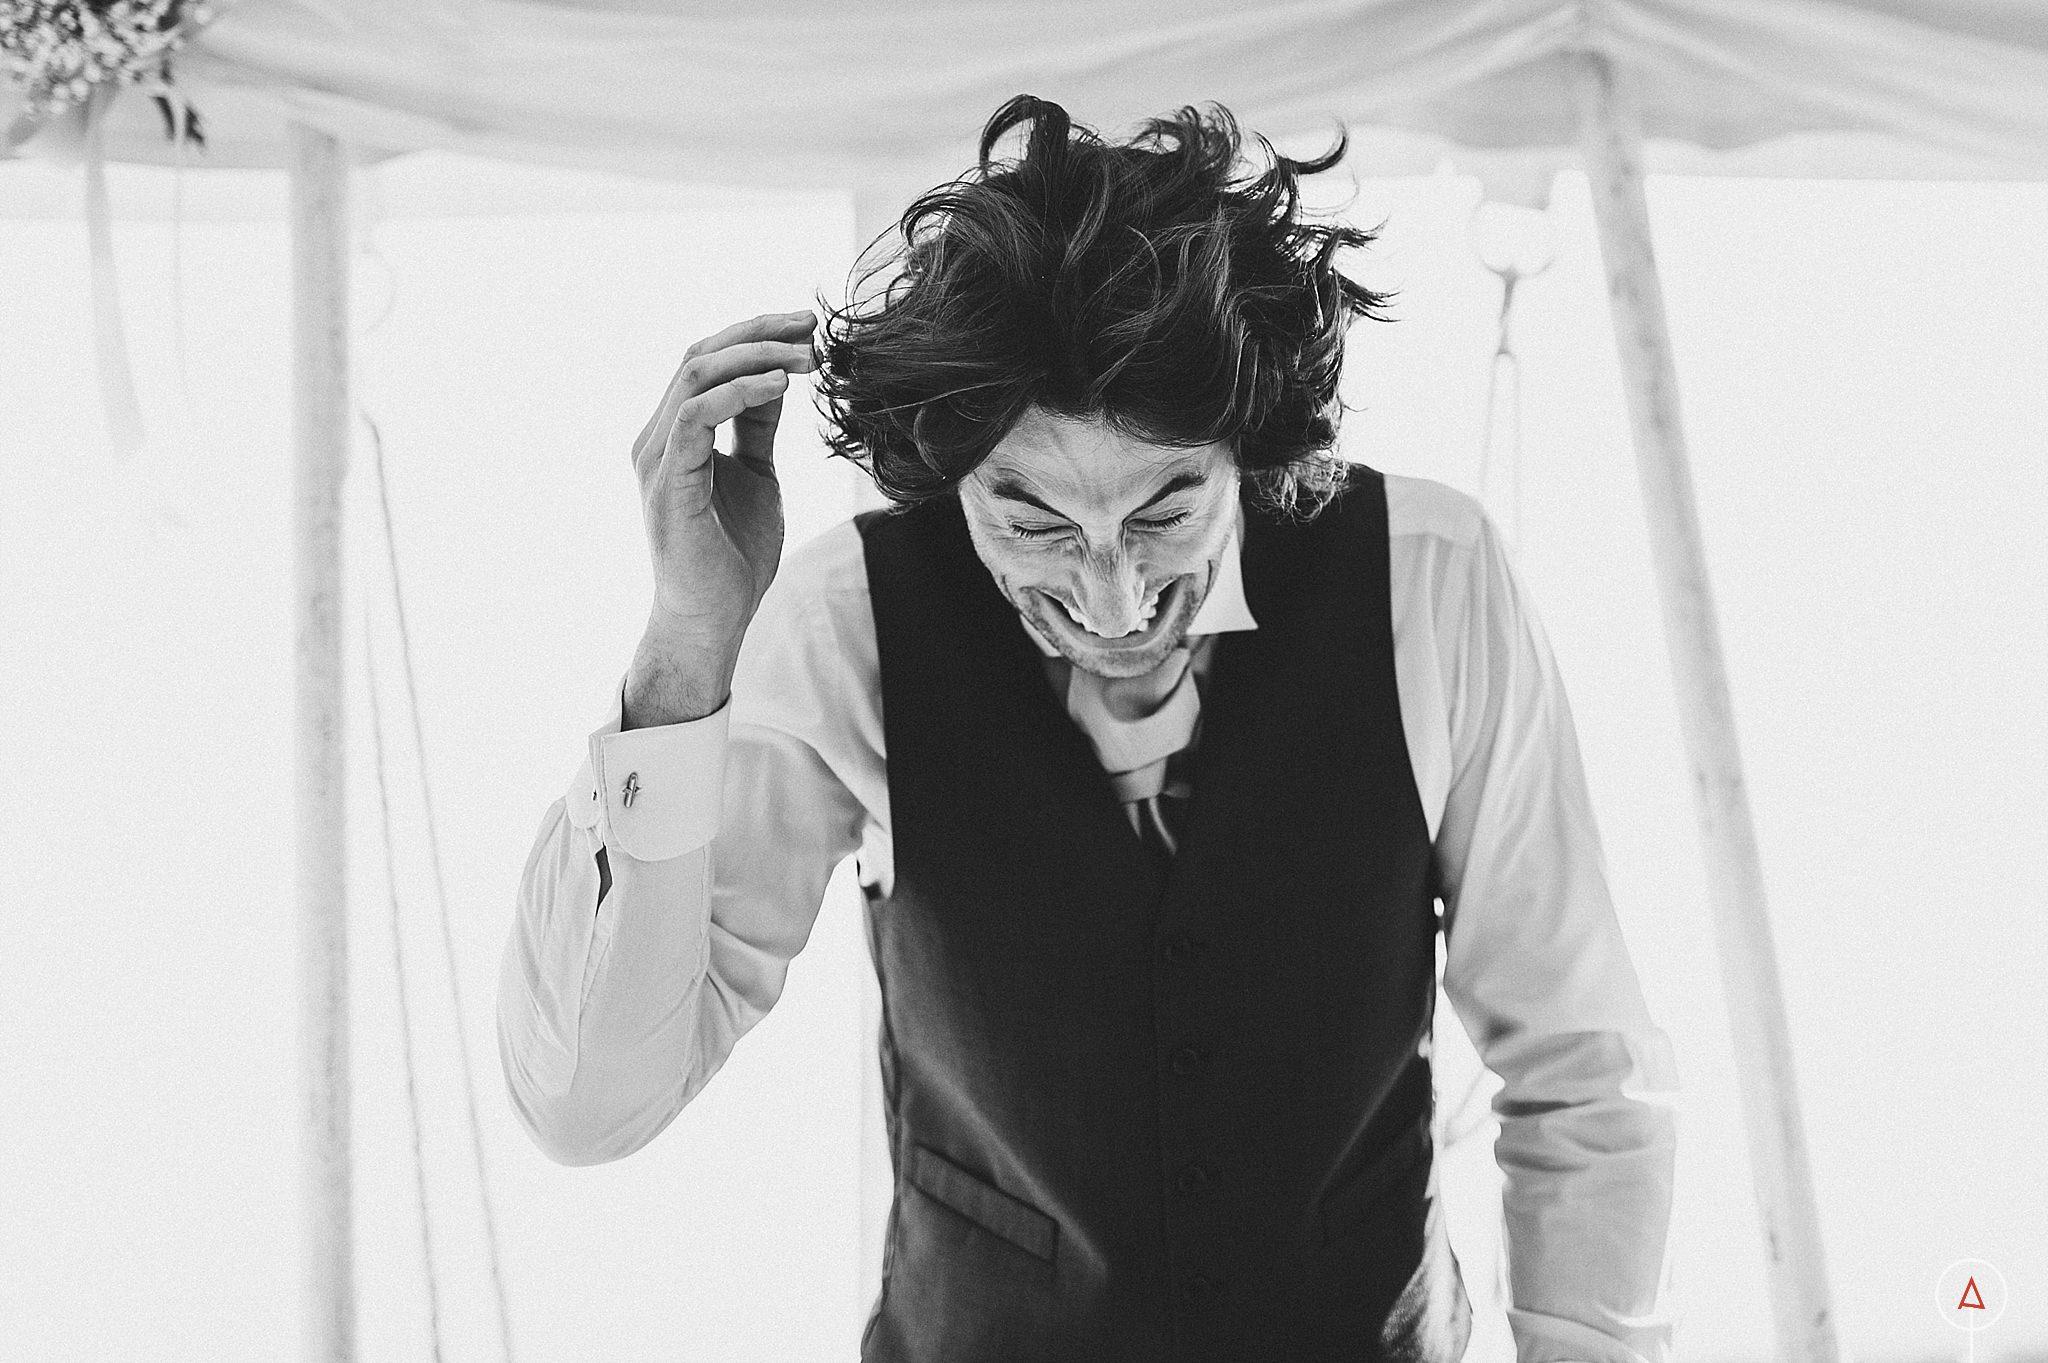 cardiff-wedding-photographer-aga-tomaszek_0398